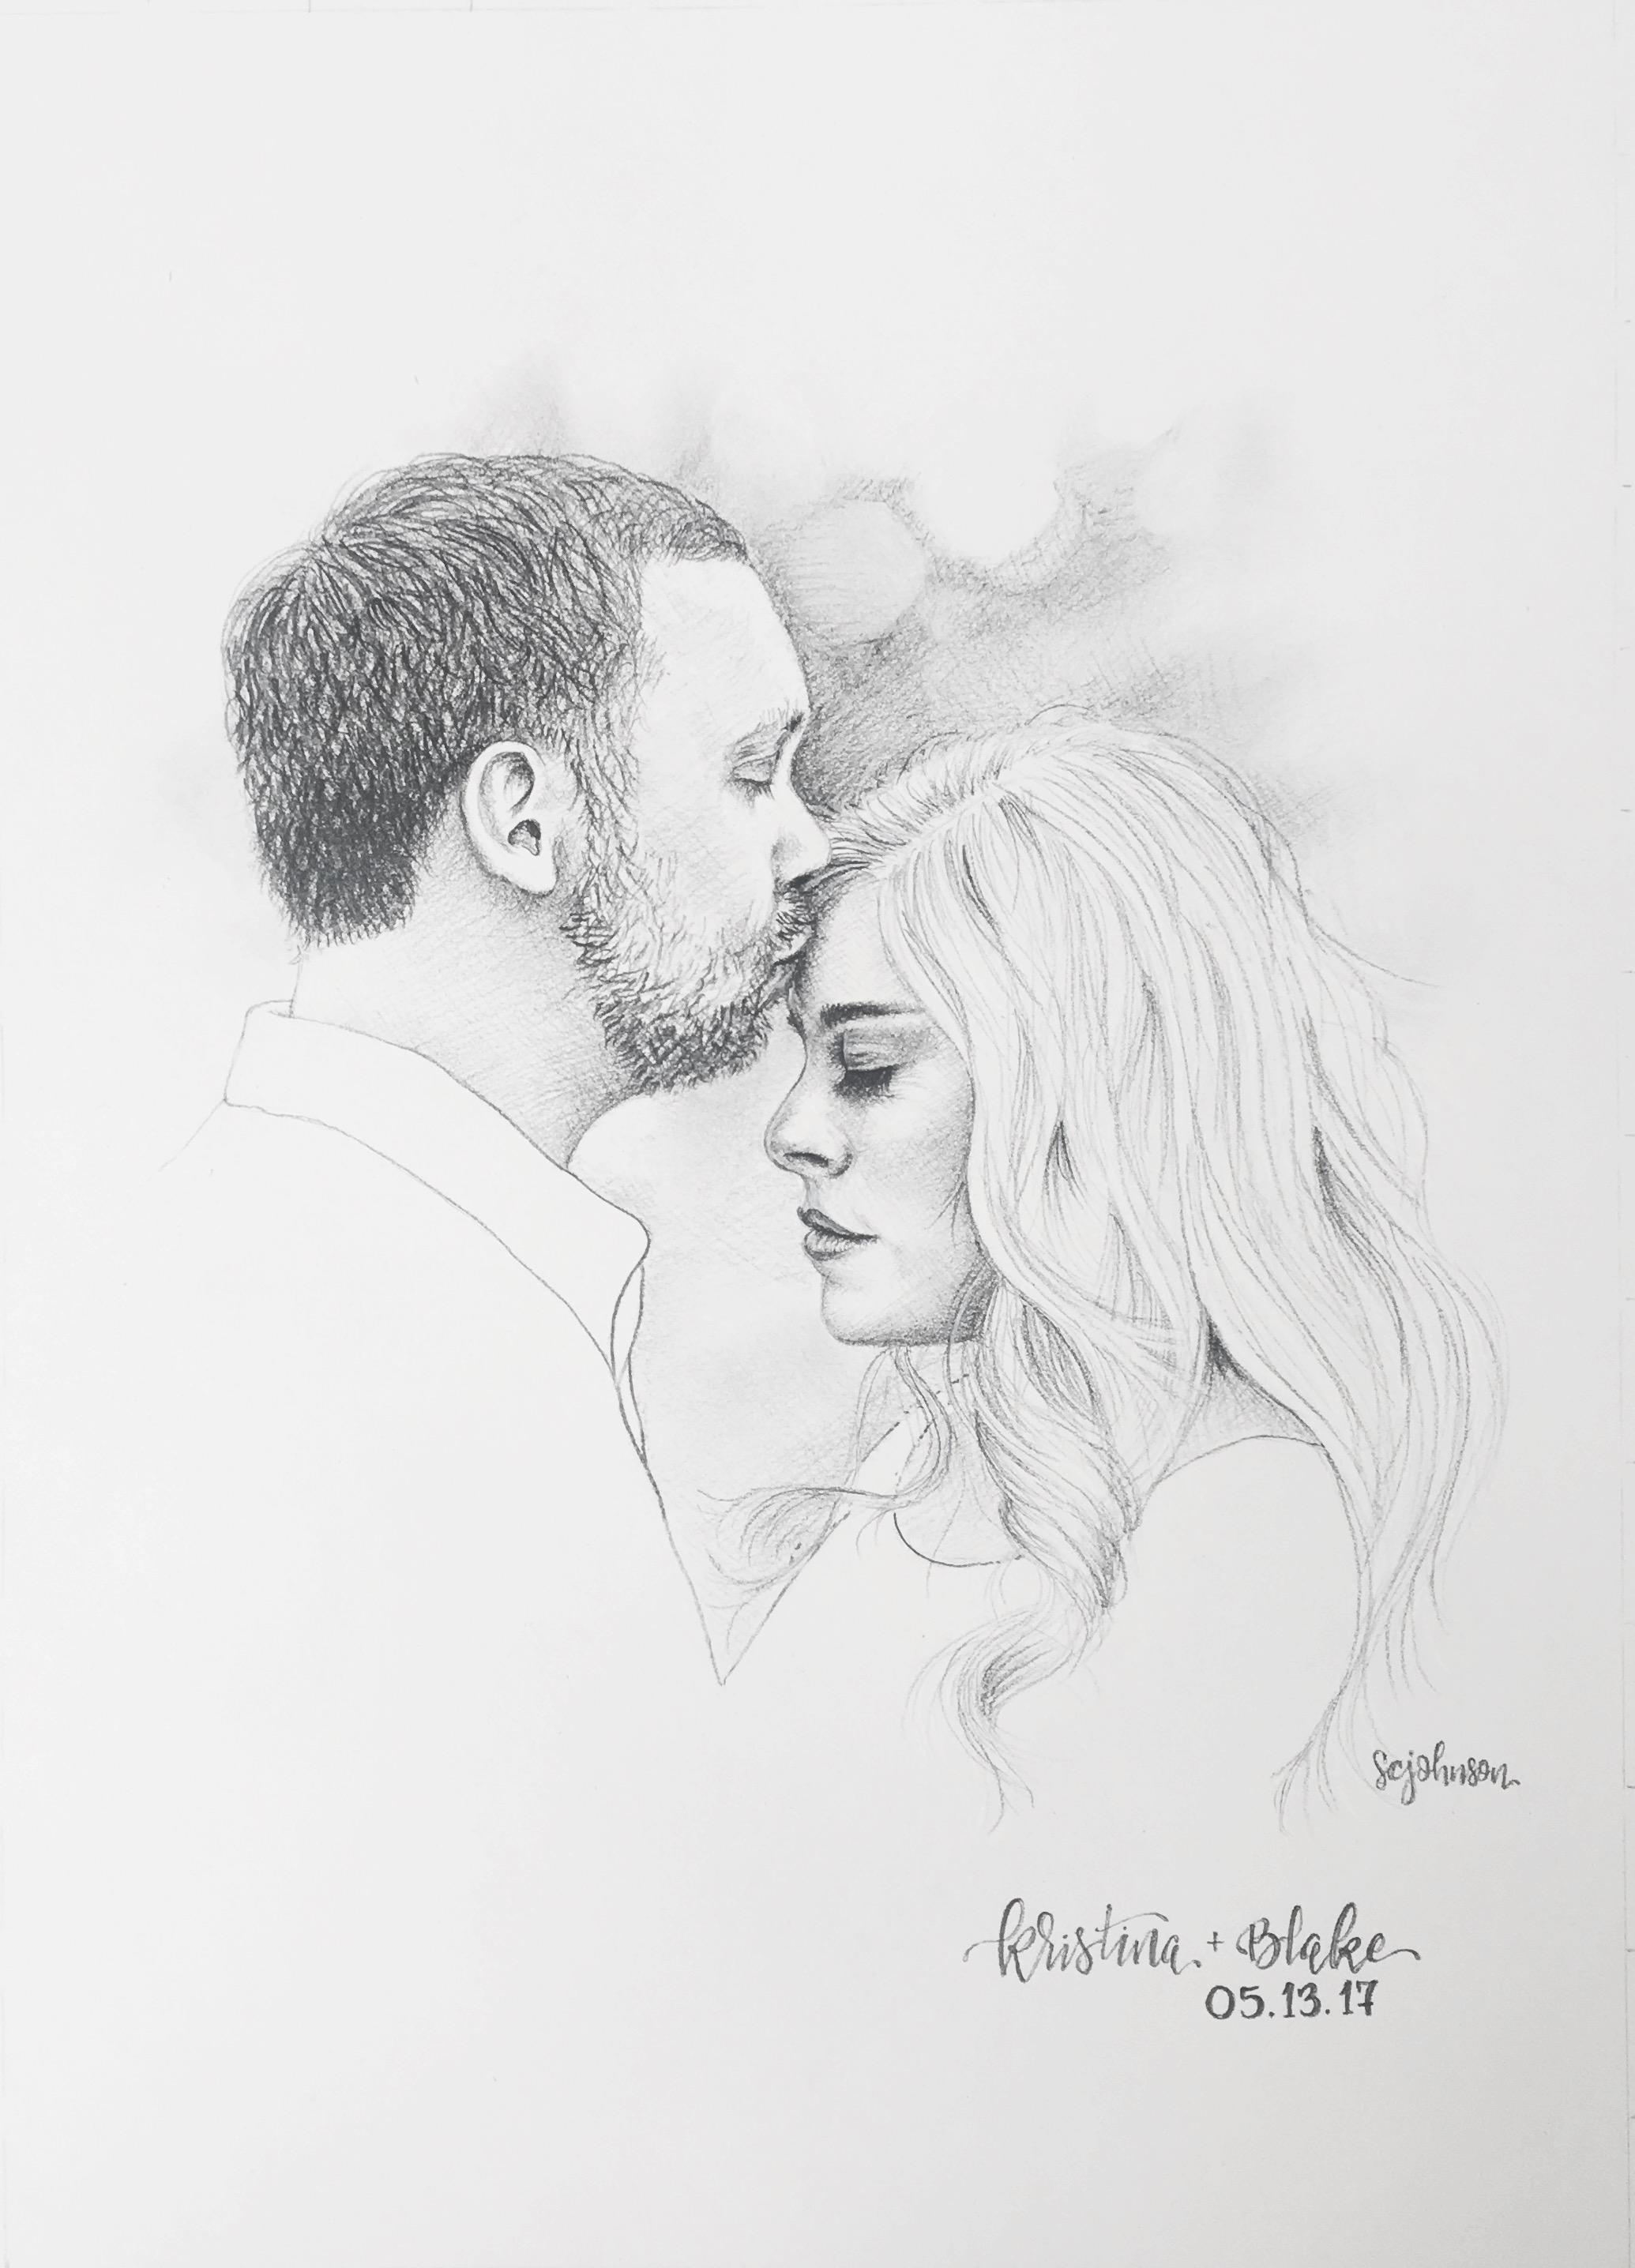 KRISTINA + BLAKE